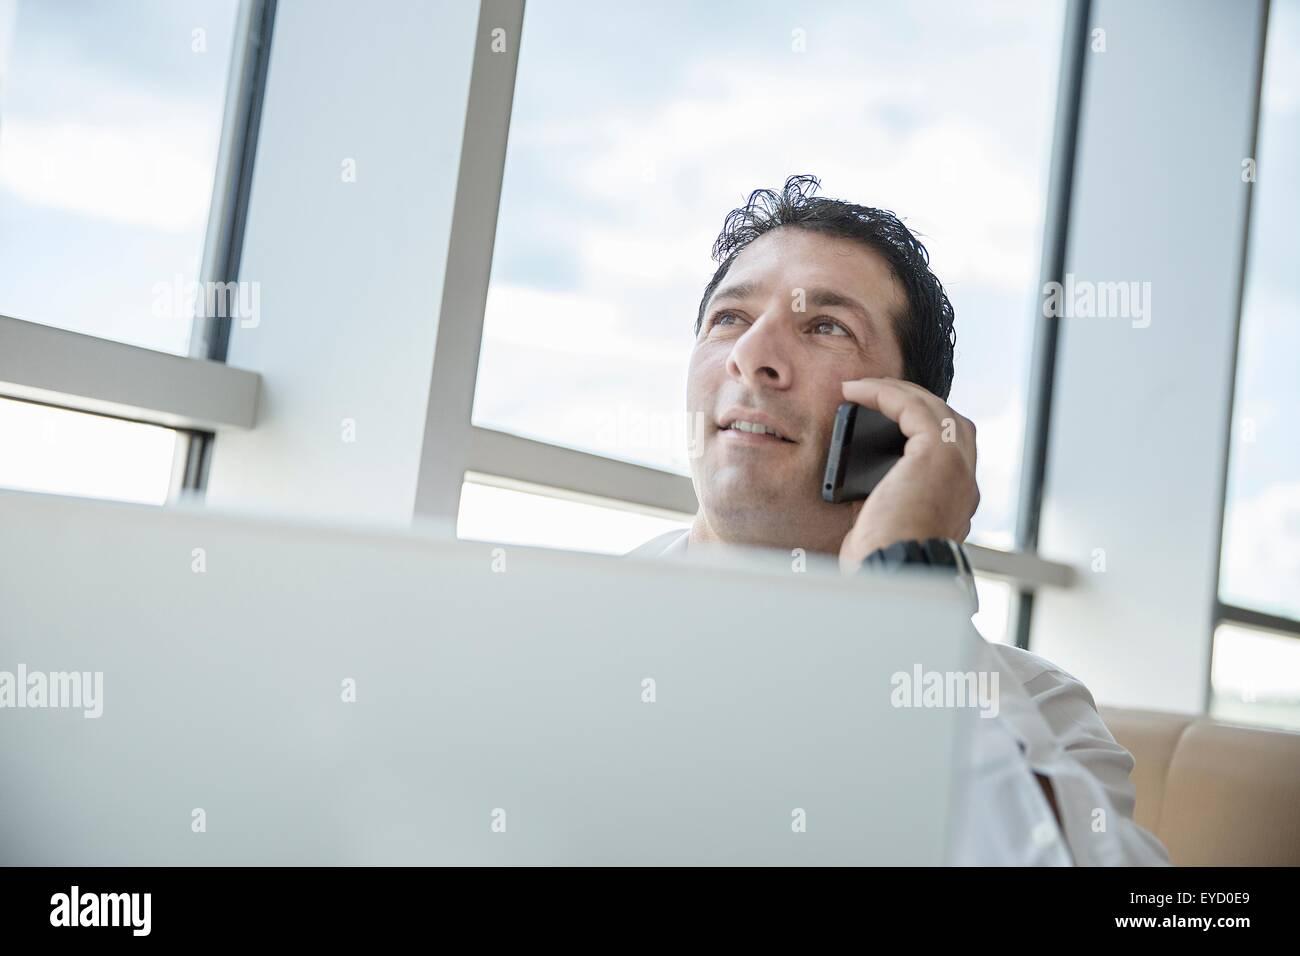 Dock harbormaster talking on smartphone in control room - Stock Image